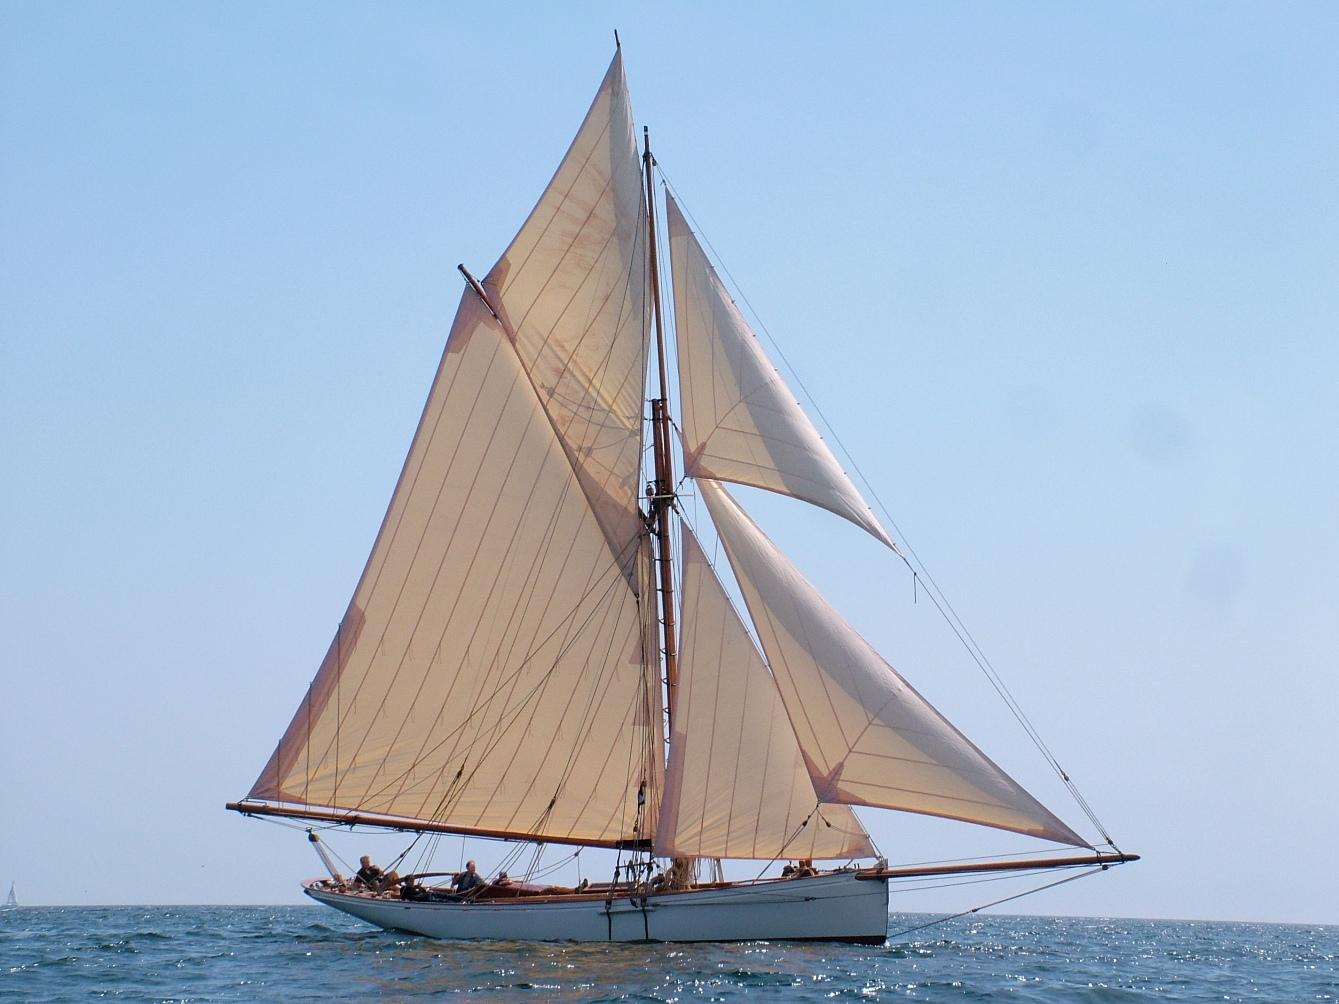 Victorian gentleman's racing cutter Integrity under sail ...